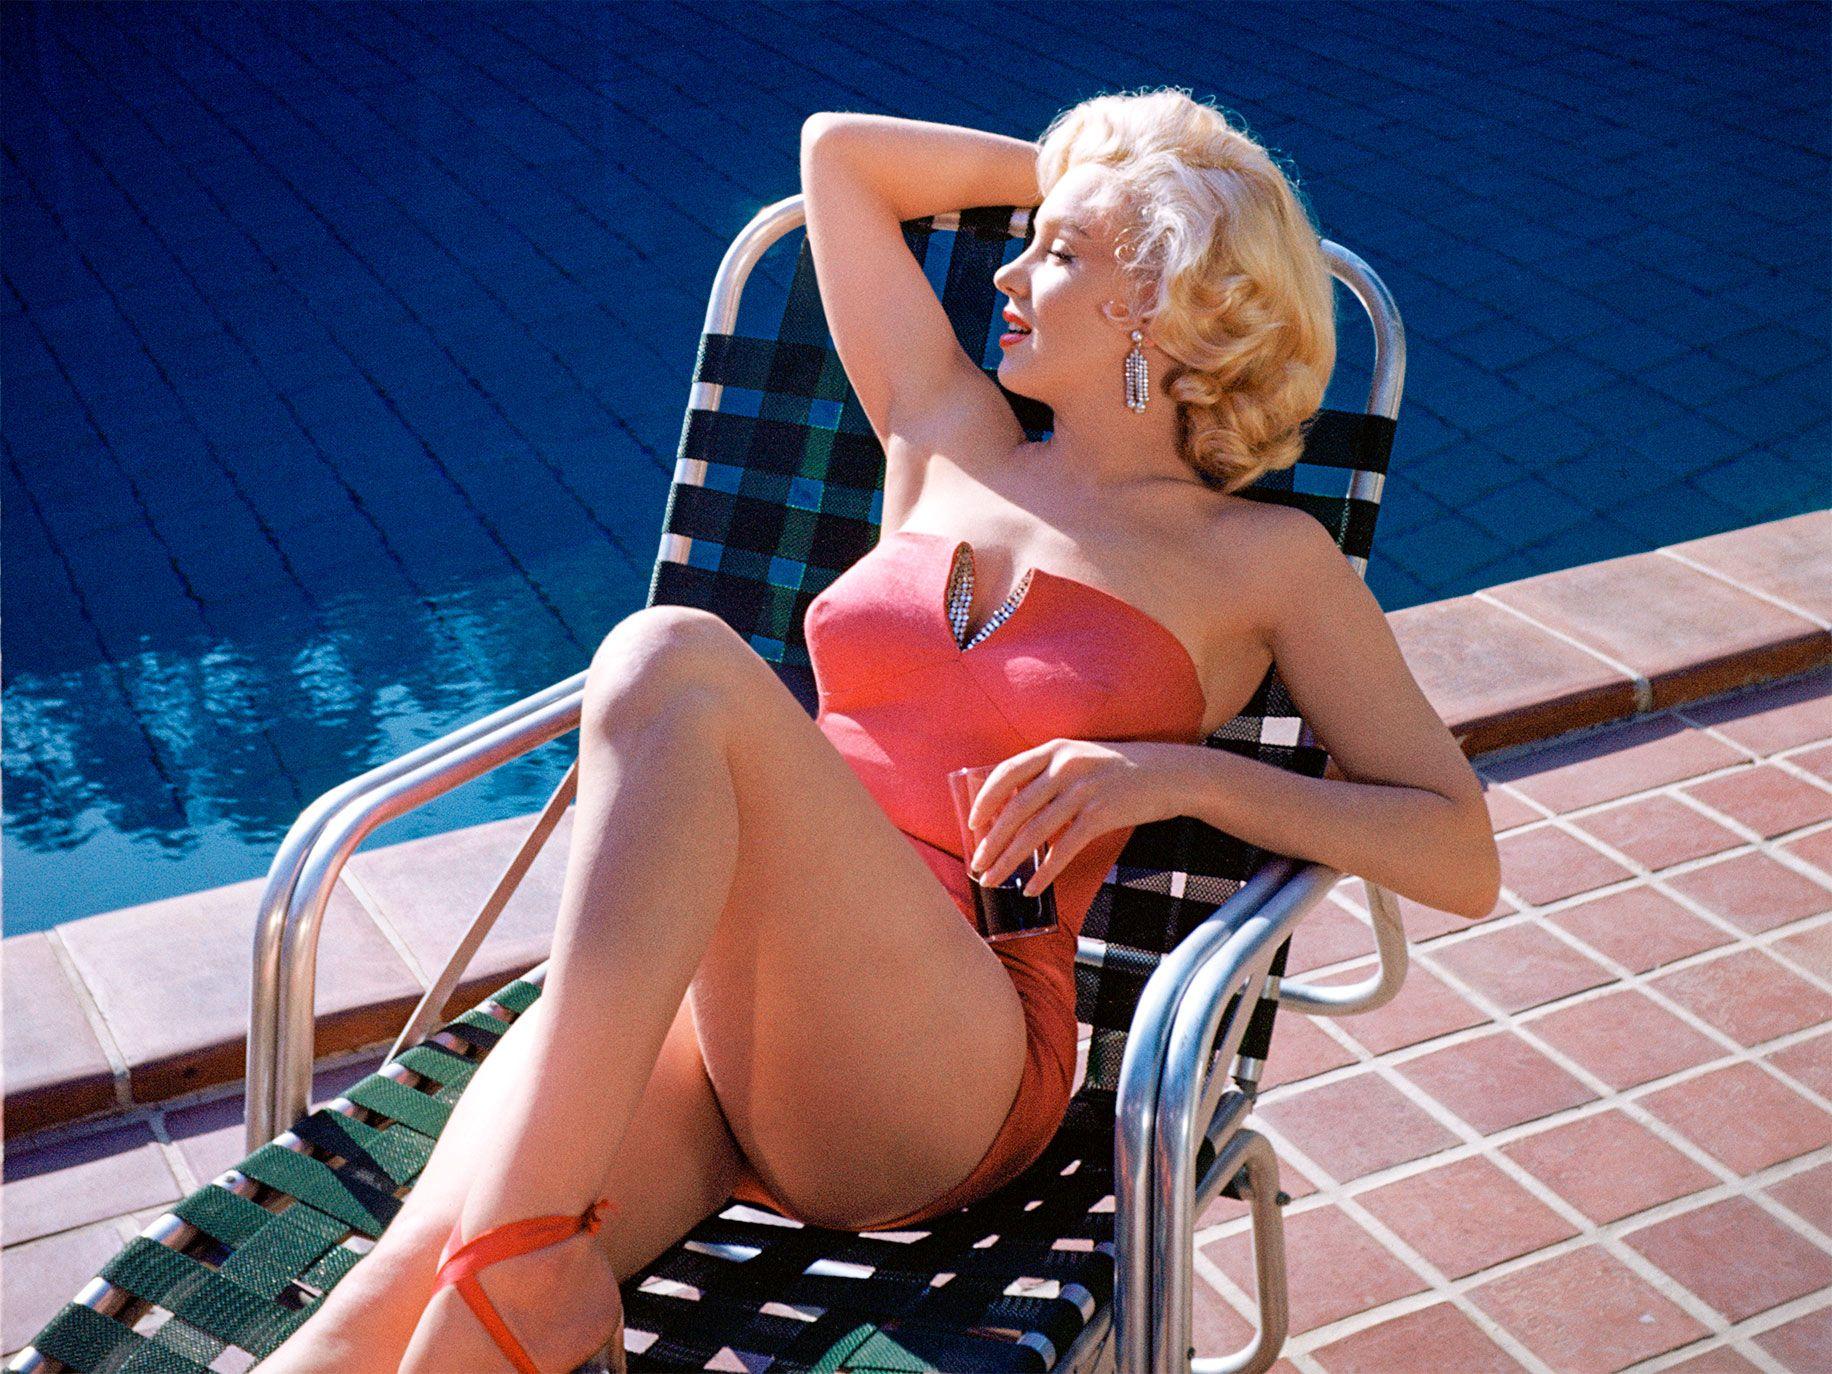 Monroe posing for photos by the swimming pool at Harold Lloyd's Greenacres estate in 1953.